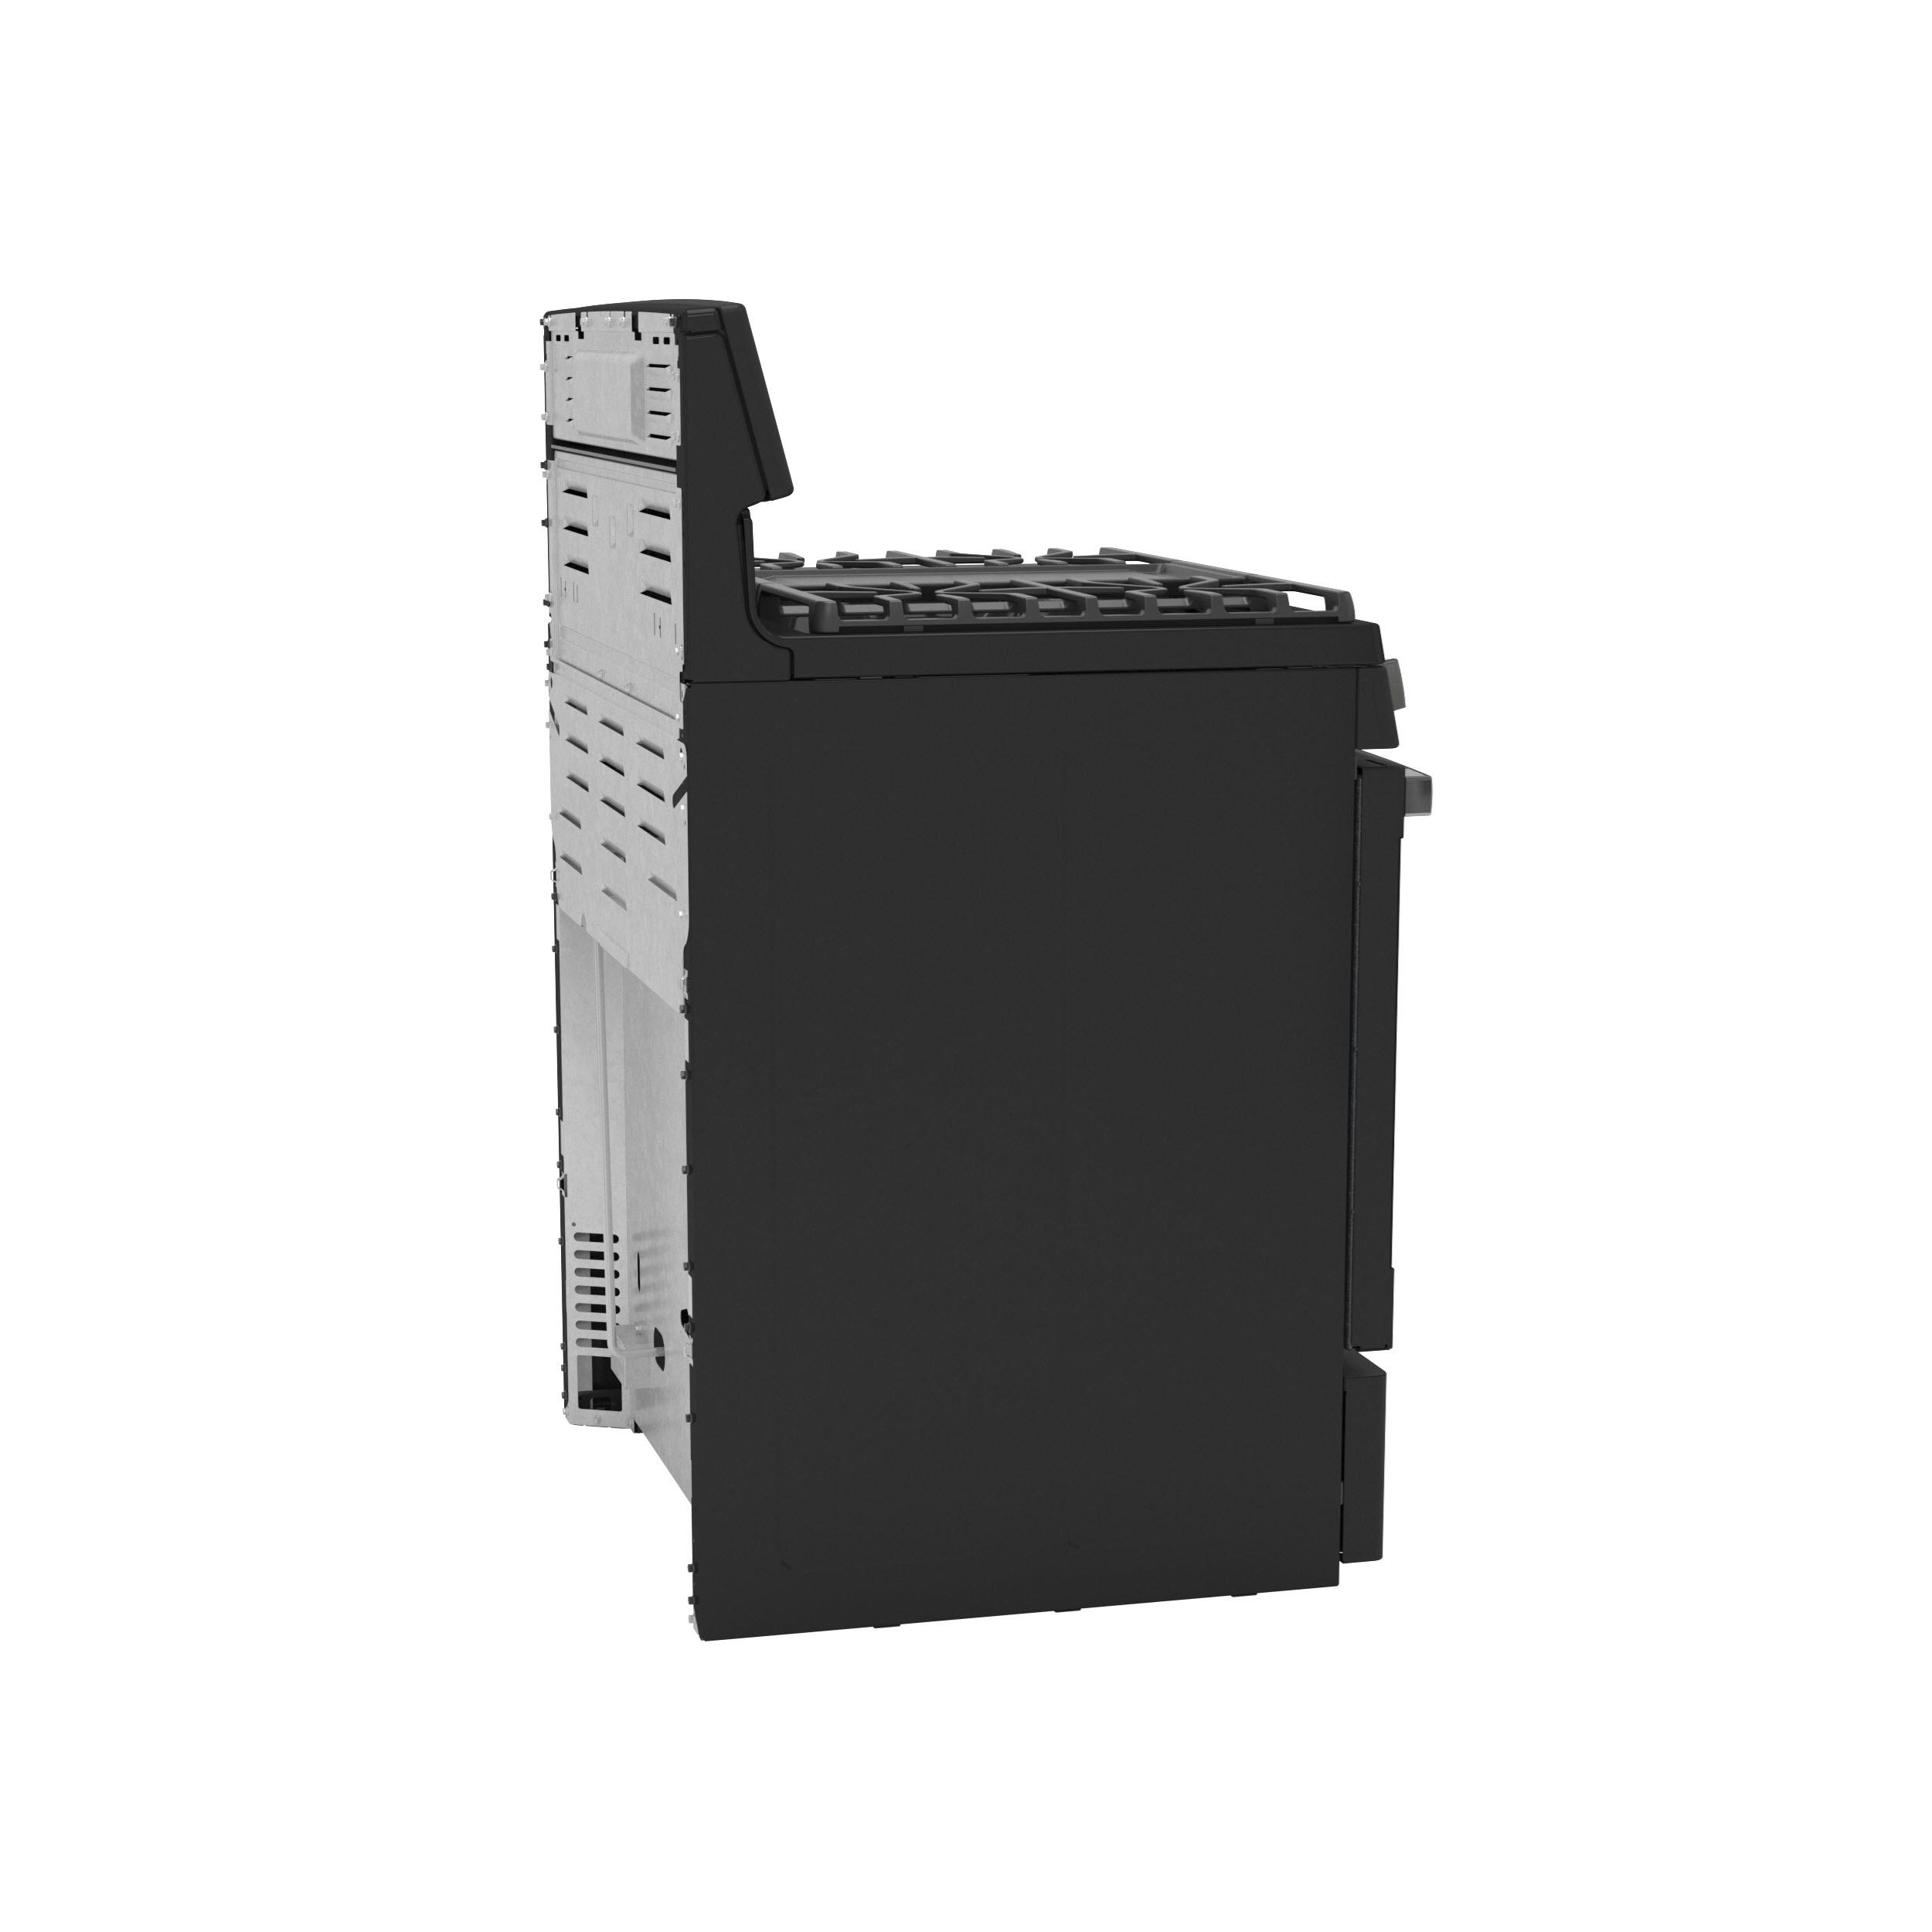 "Model: JGB660FPDS | GE GE® 30"" Free-Standing Gas Range"